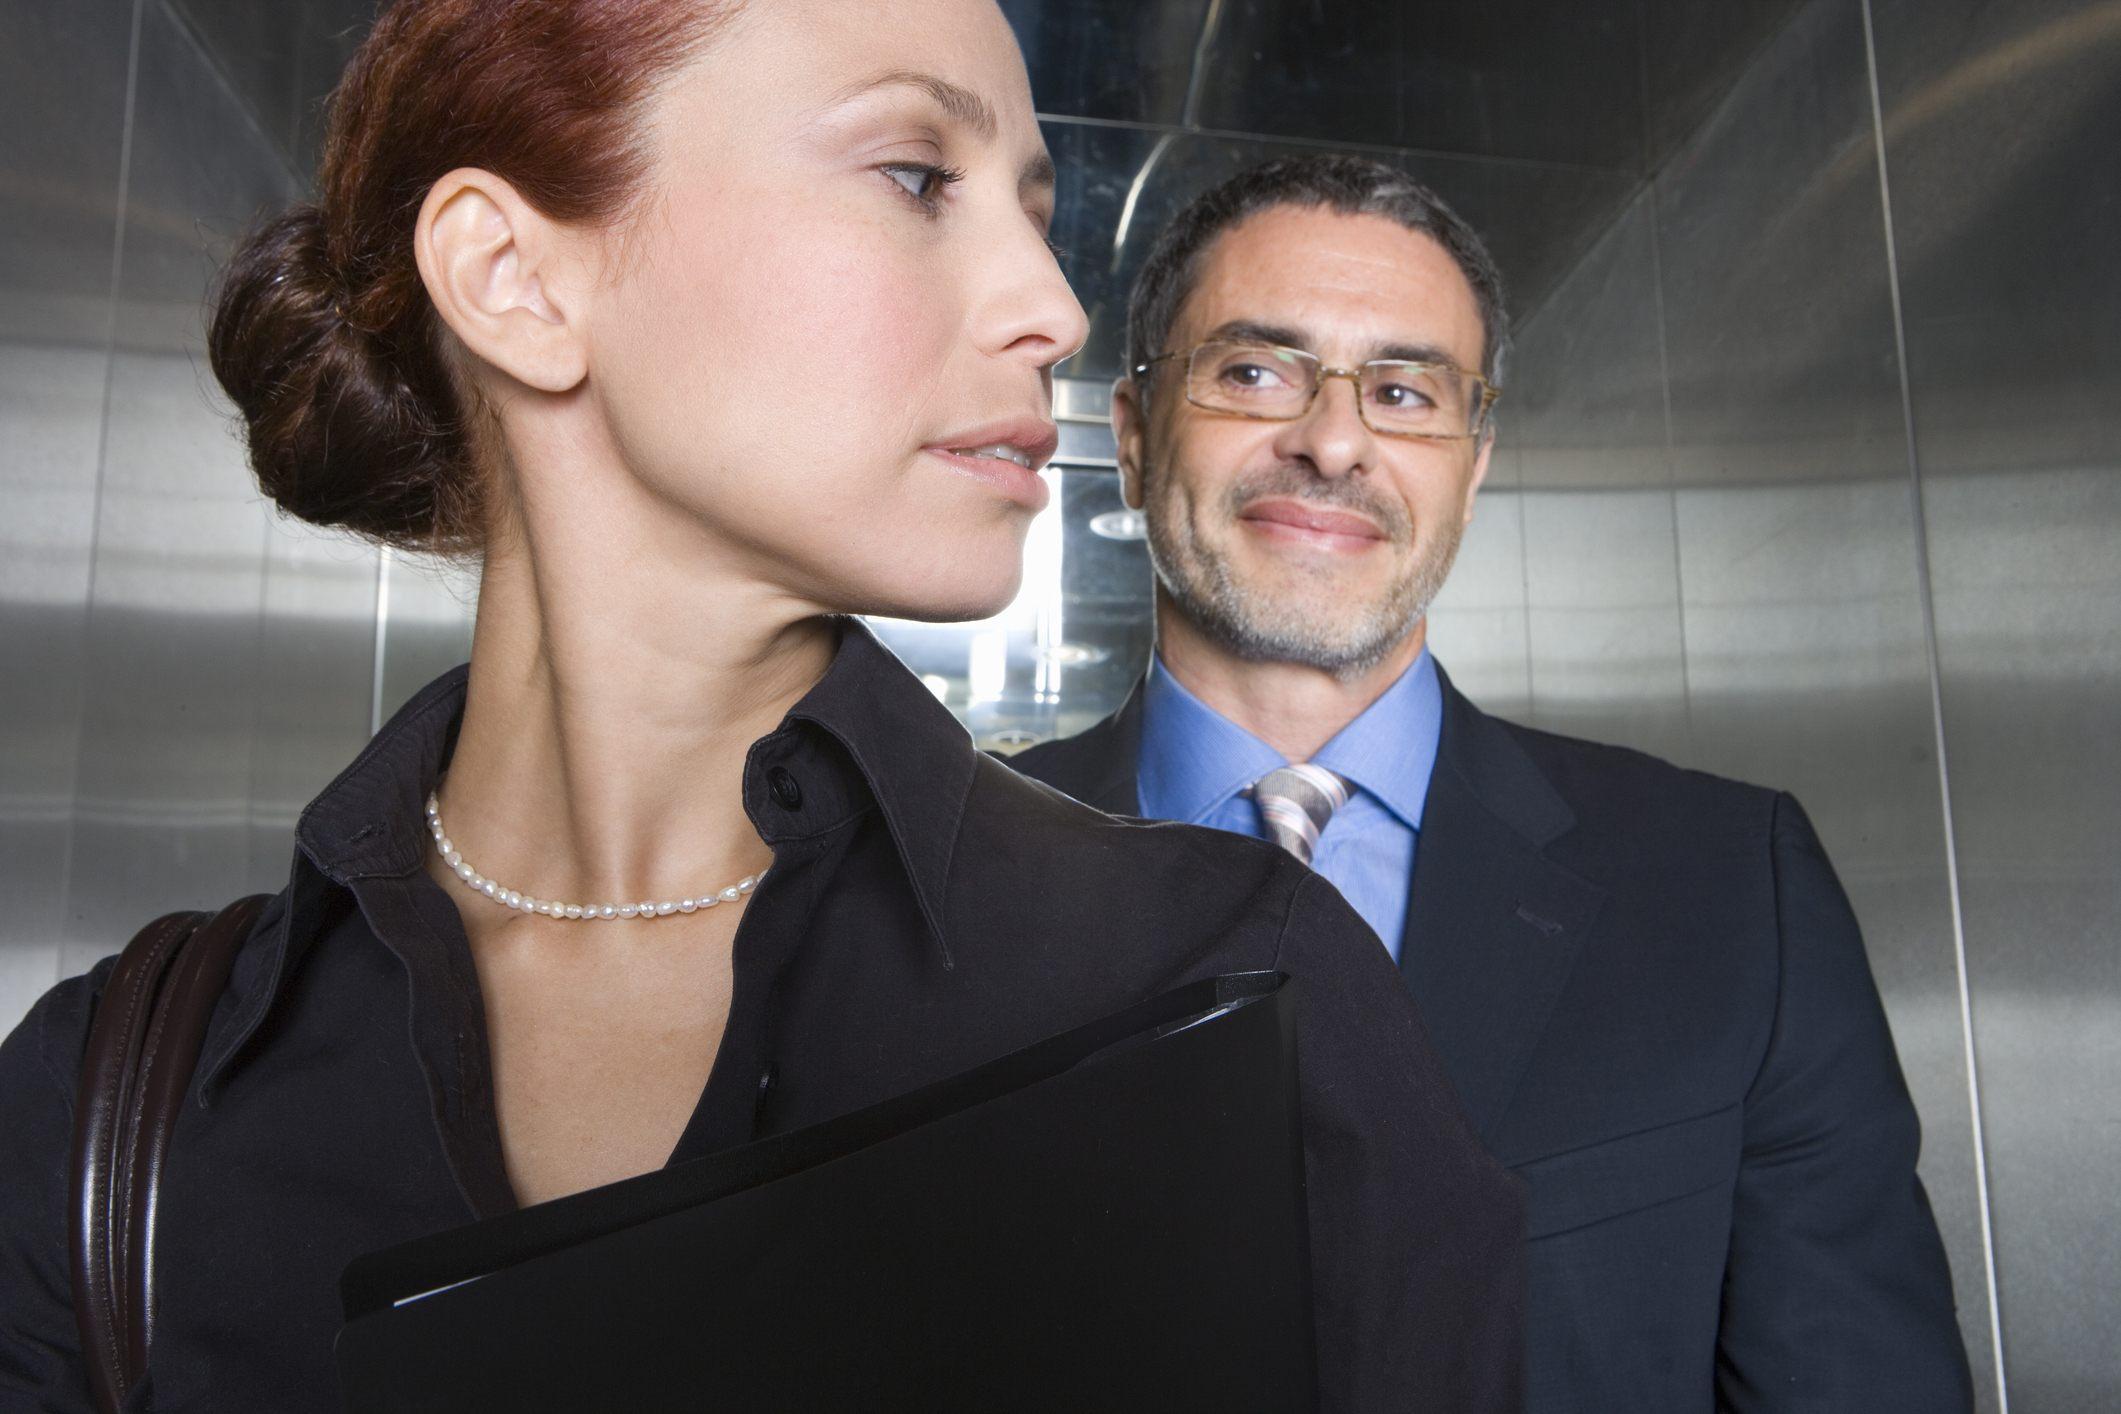 Creepy business man in elevator